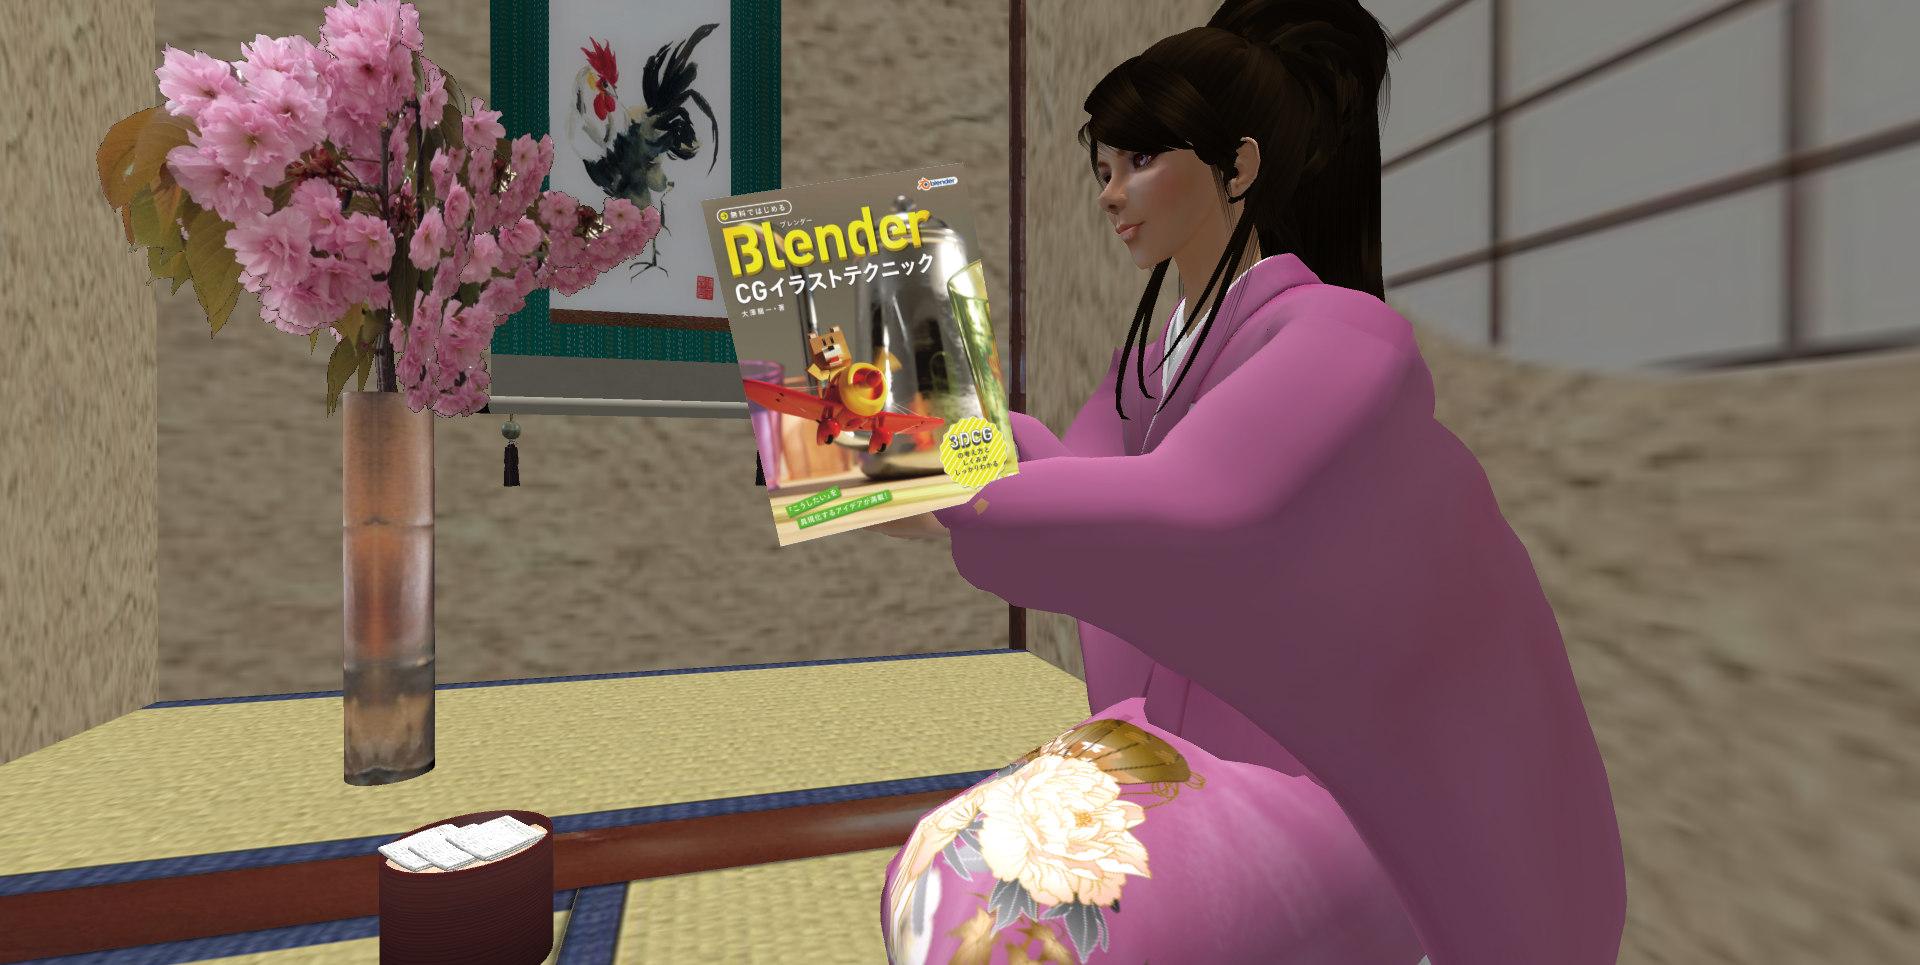 「Blender CGイラストテクニック」を読む敏子